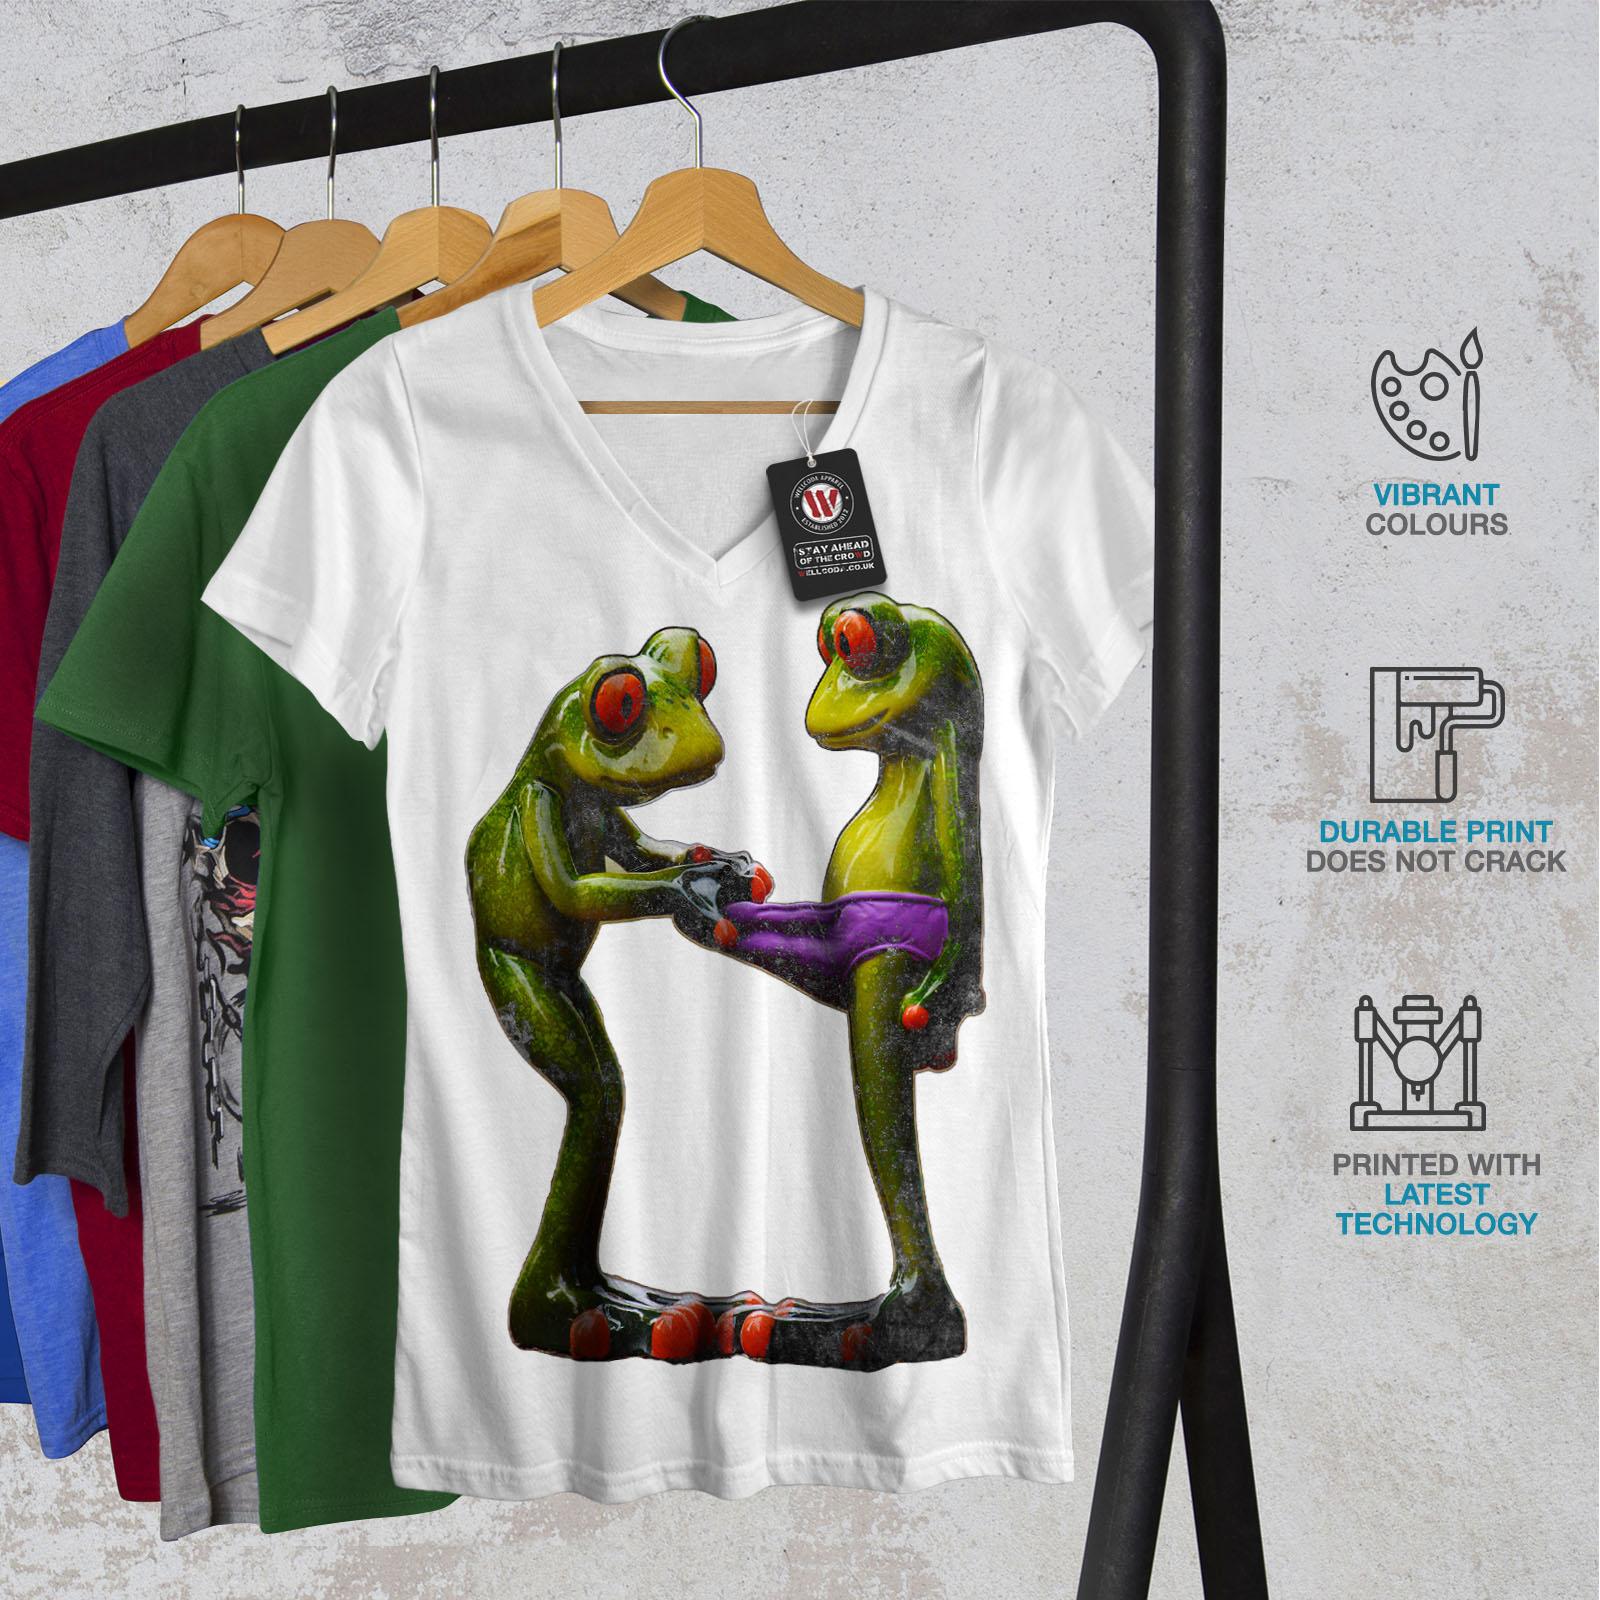 Wellcoda-RANE-Cool-scherzo-da-Donna-V-Neck-T-shirt-Biancheria-Intima-Design-Grafico-Tee miniatura 8